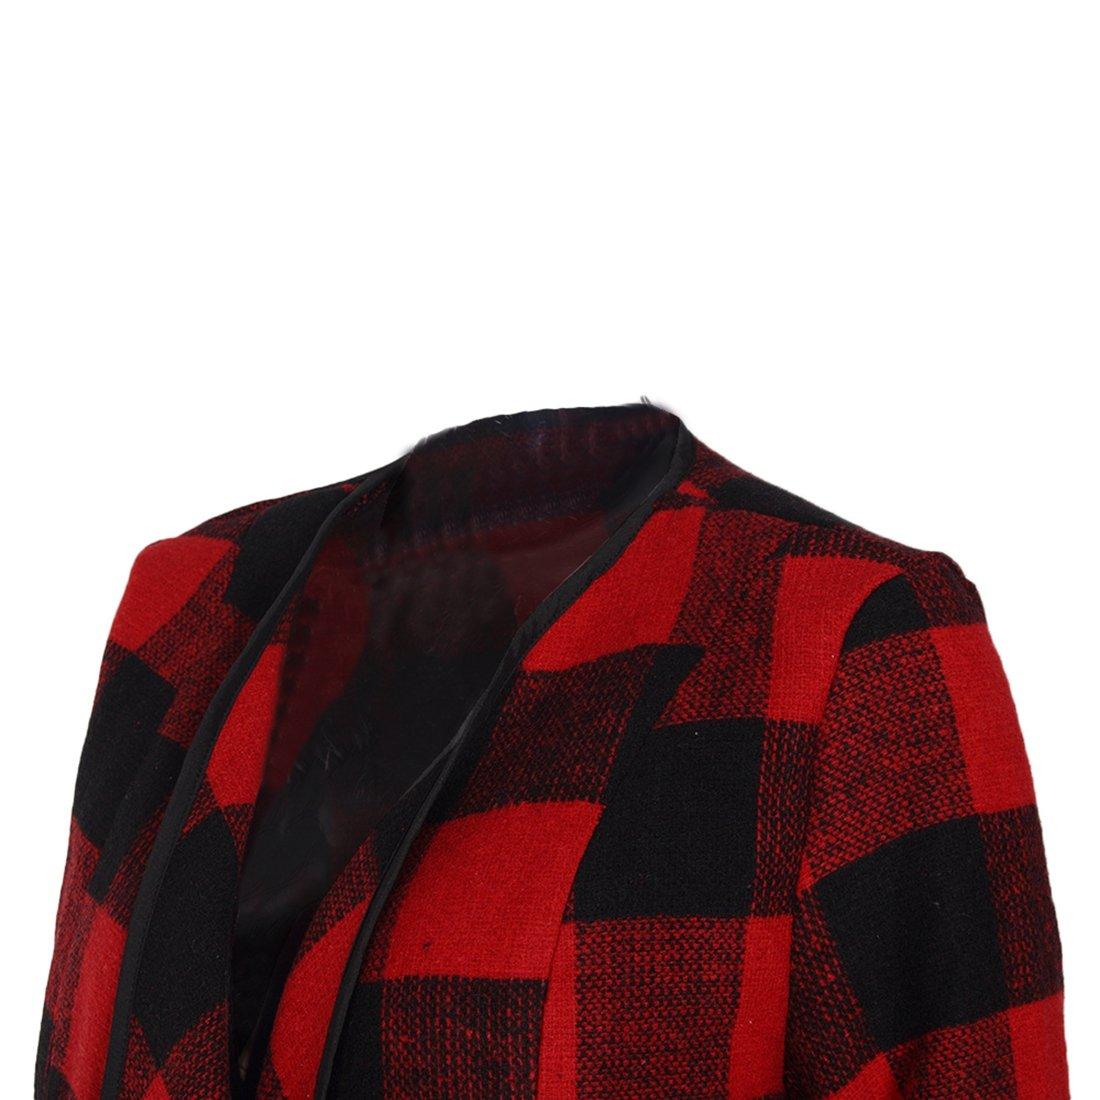 Shinekoo Women Cardigan Jacket Checked Plaid Open Front Coat Outwear by Shinekoo (Image #6)